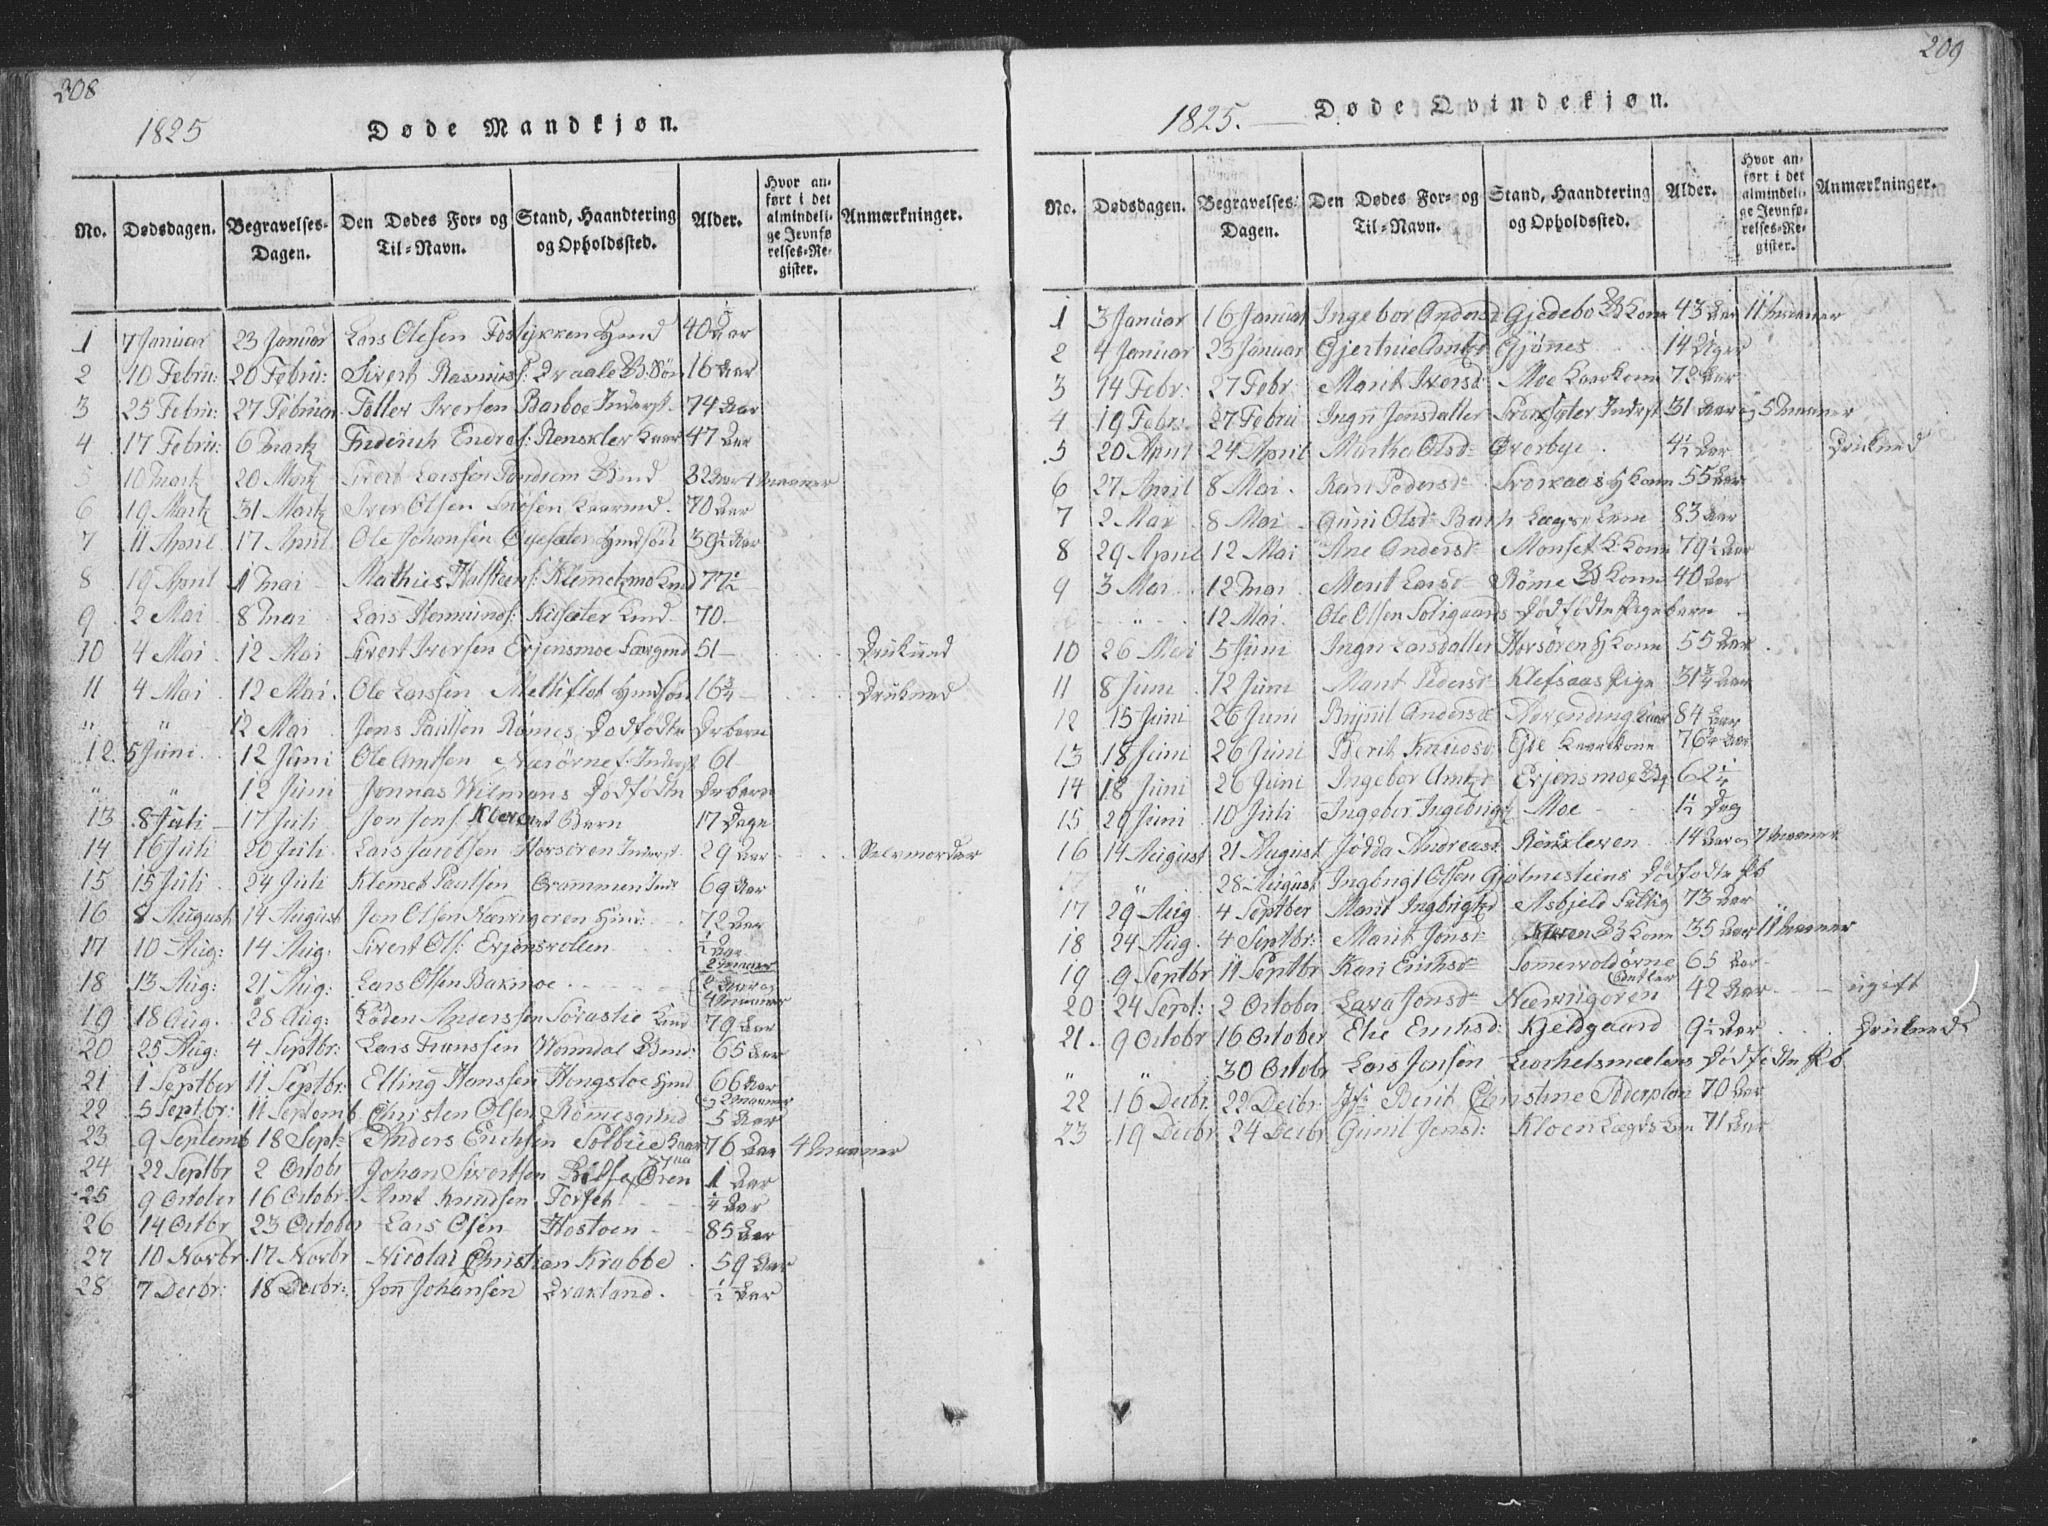 SAT, Ministerialprotokoller, klokkerbøker og fødselsregistre - Sør-Trøndelag, 668/L0816: Parish register (copy) no. 668C05, 1816-1893, p. 208-209